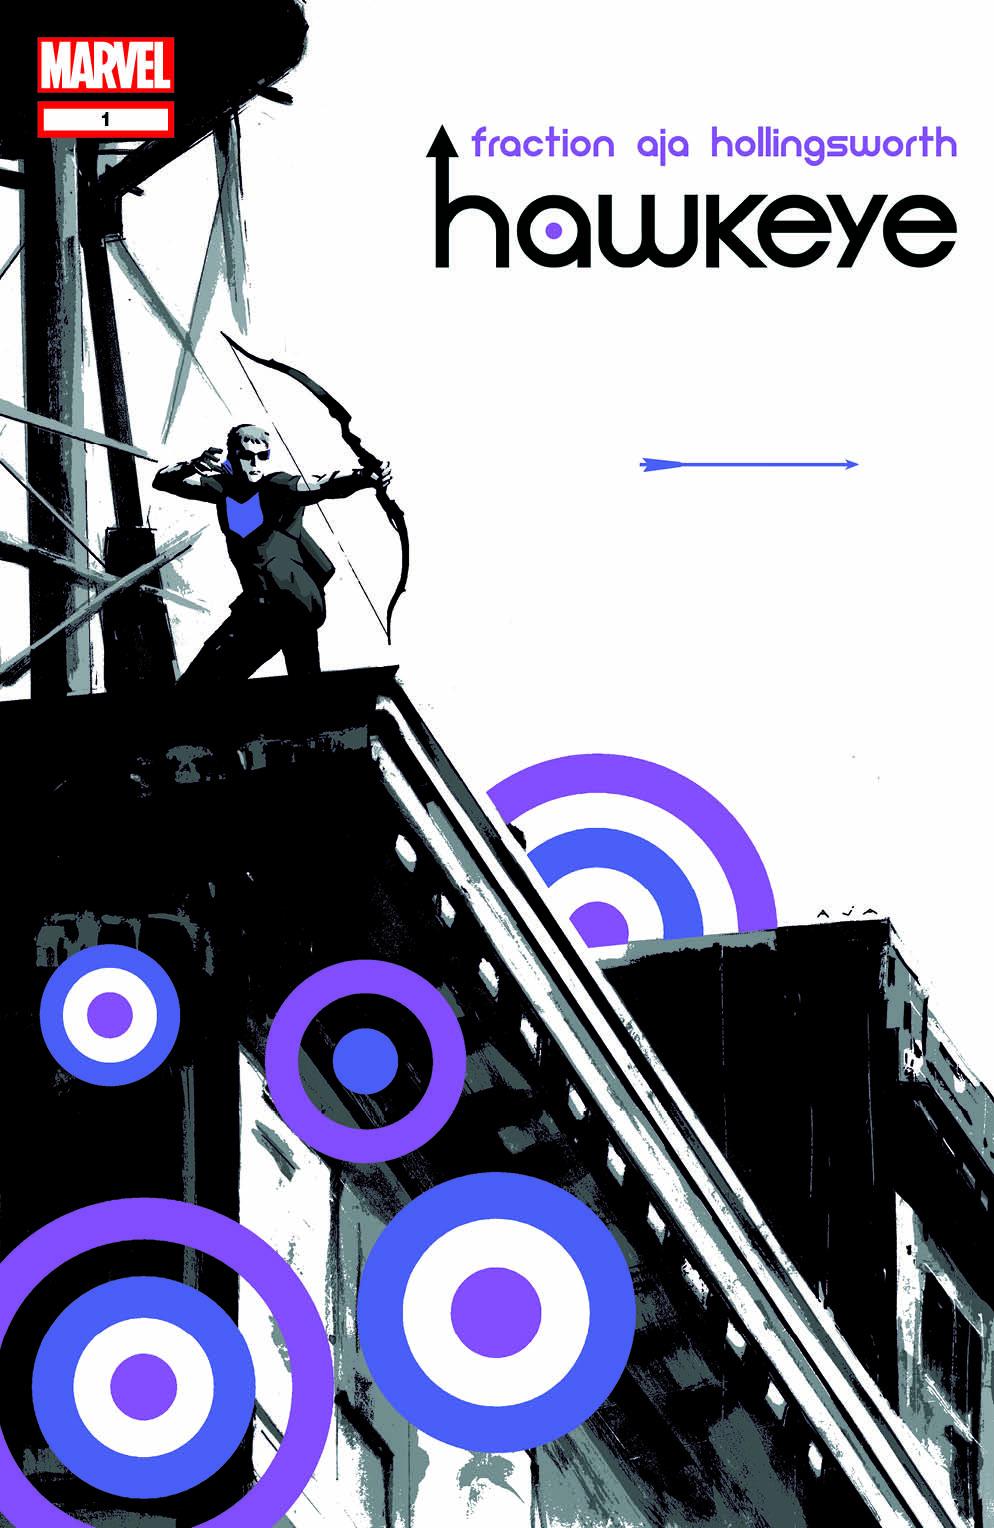 Hawkeye cover 1